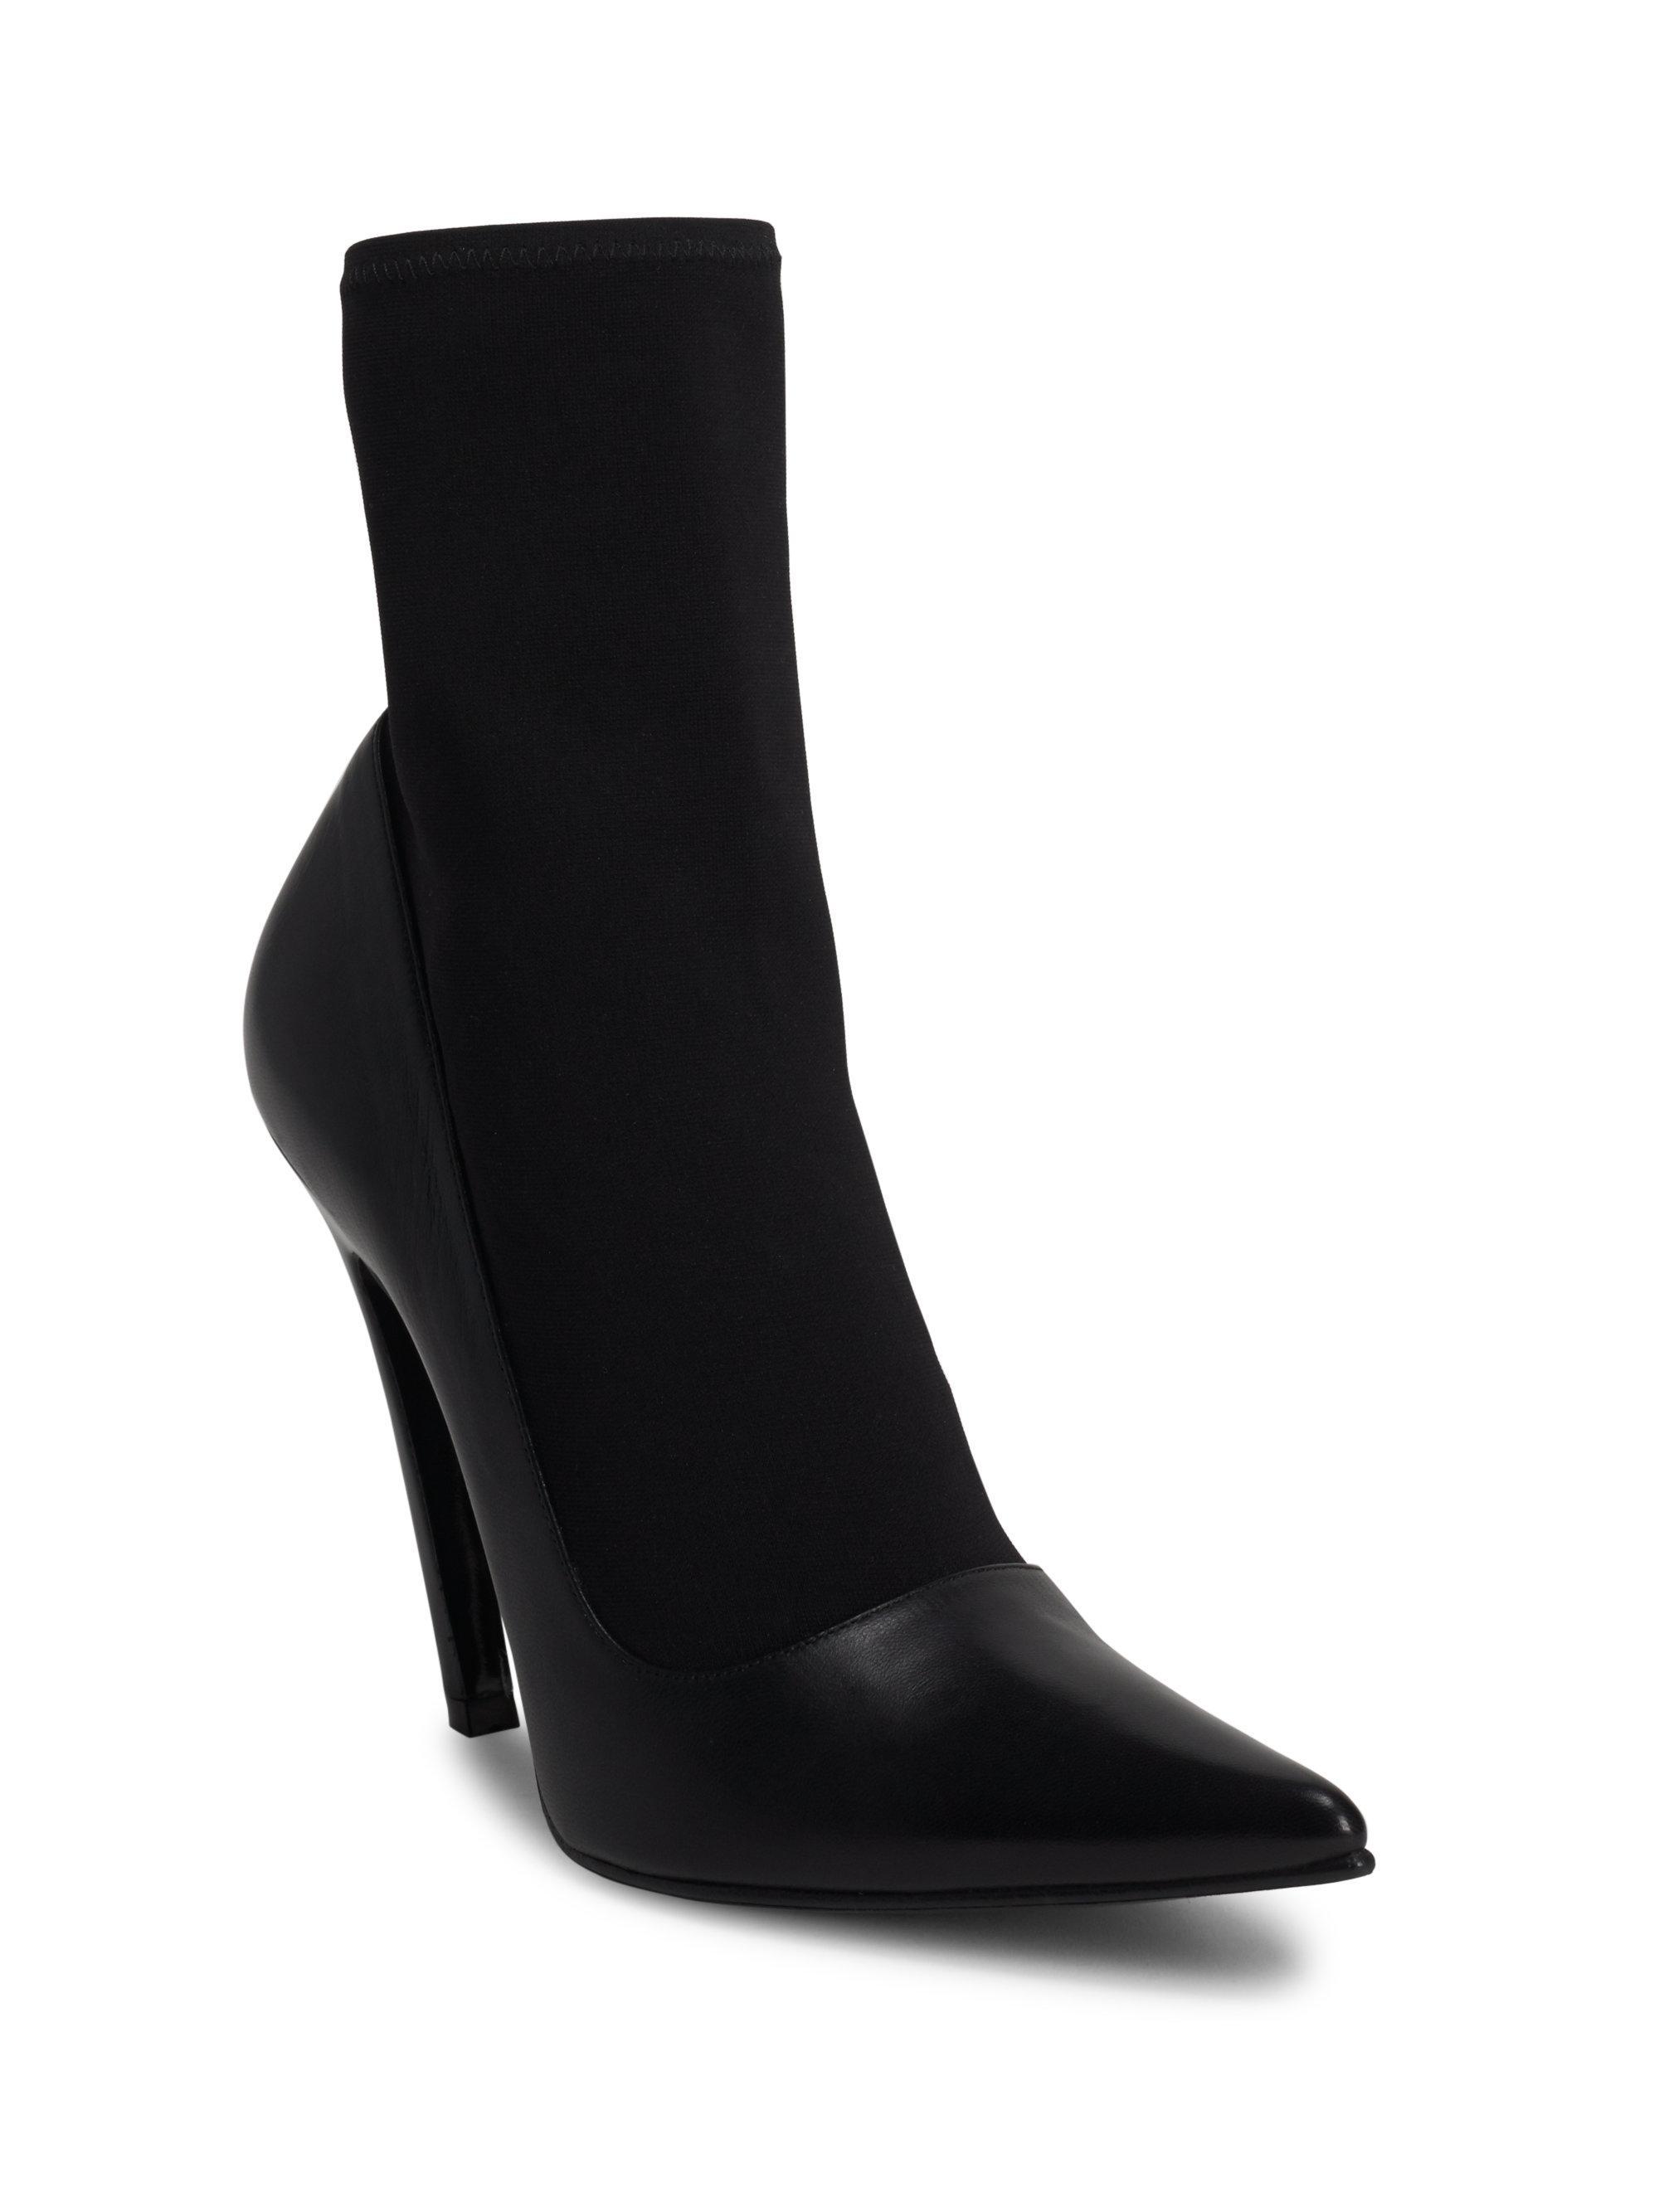 Balenciaga Sock \u0026 Leather Pumps in